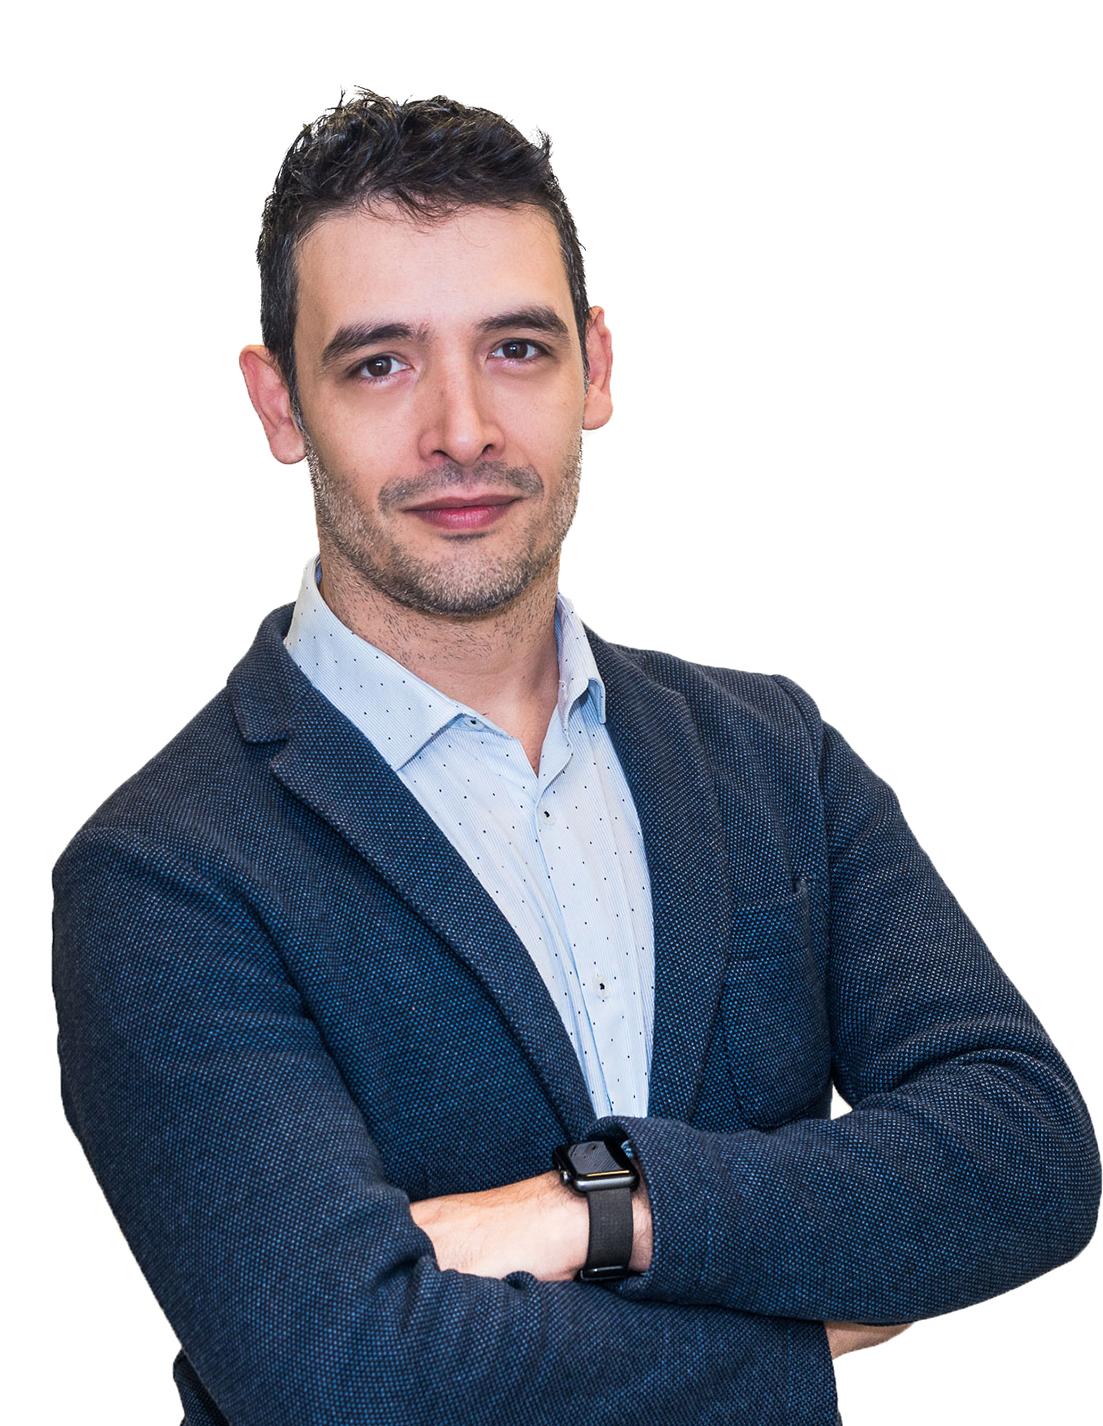 Gianluca Annunzi